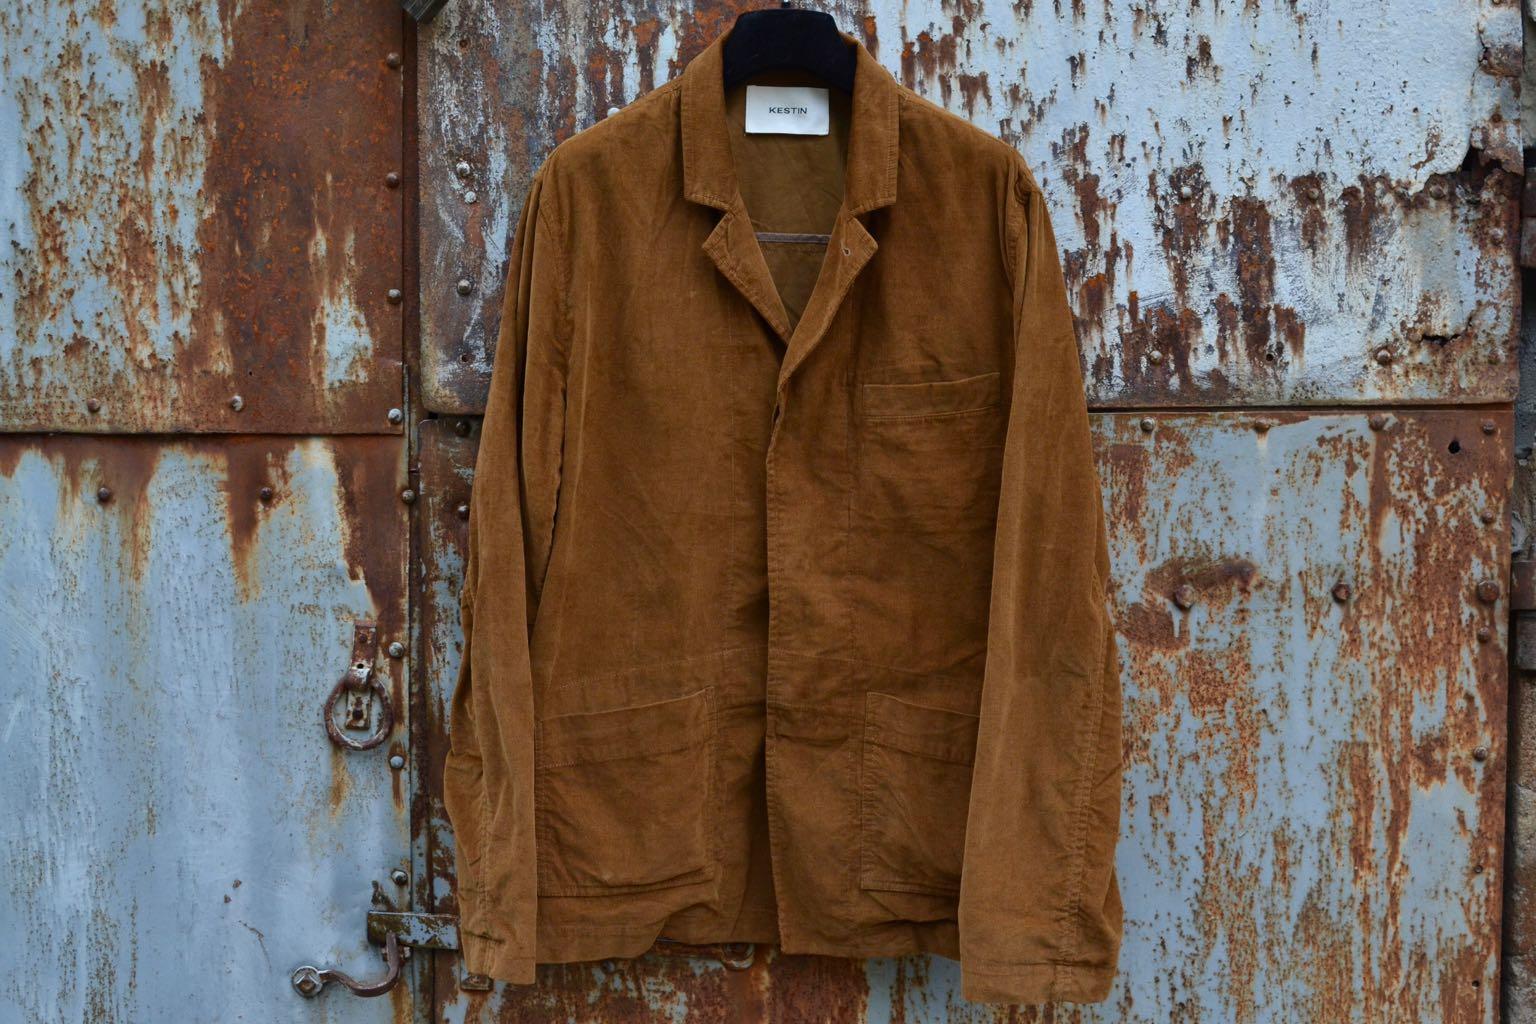 Kestin-hare-Kenmore blazer & Inverness trouser in tobacco Brisbane Moss cord